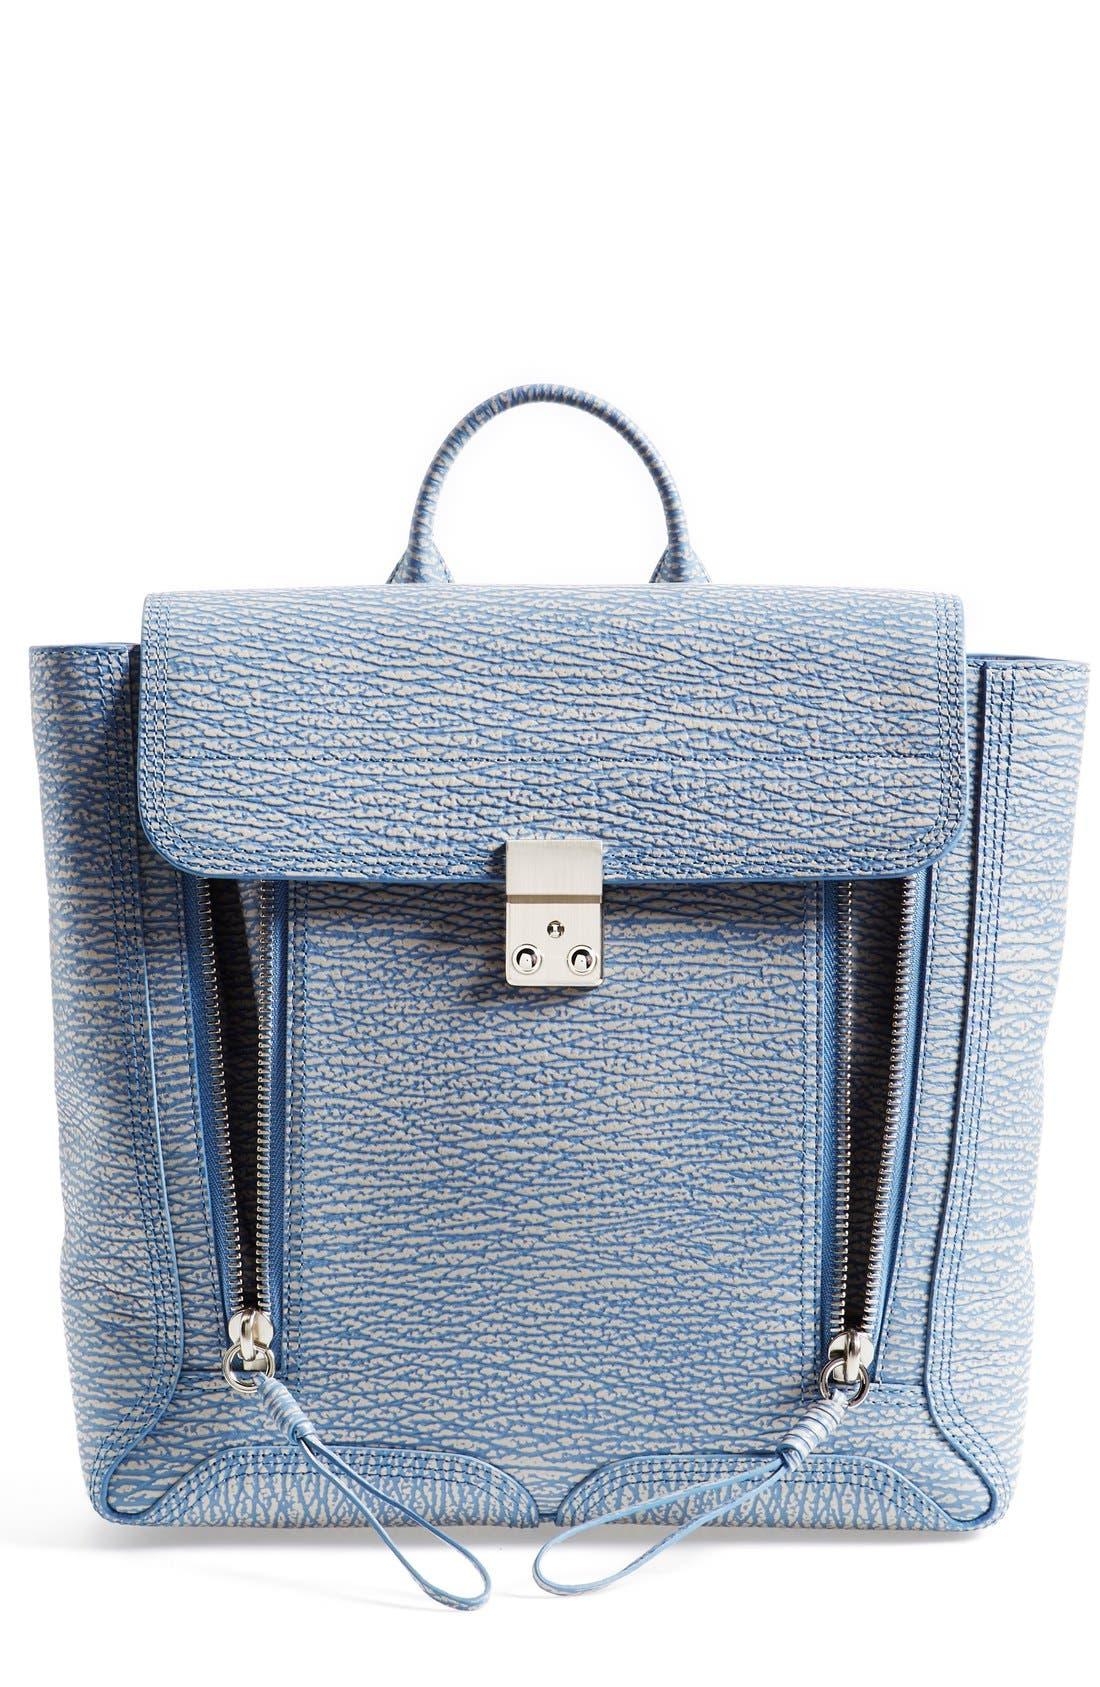 Alternate Image 1 Selected - 3.1 Phillip Lim 'Pashli' Two-Tone Leather Backpack